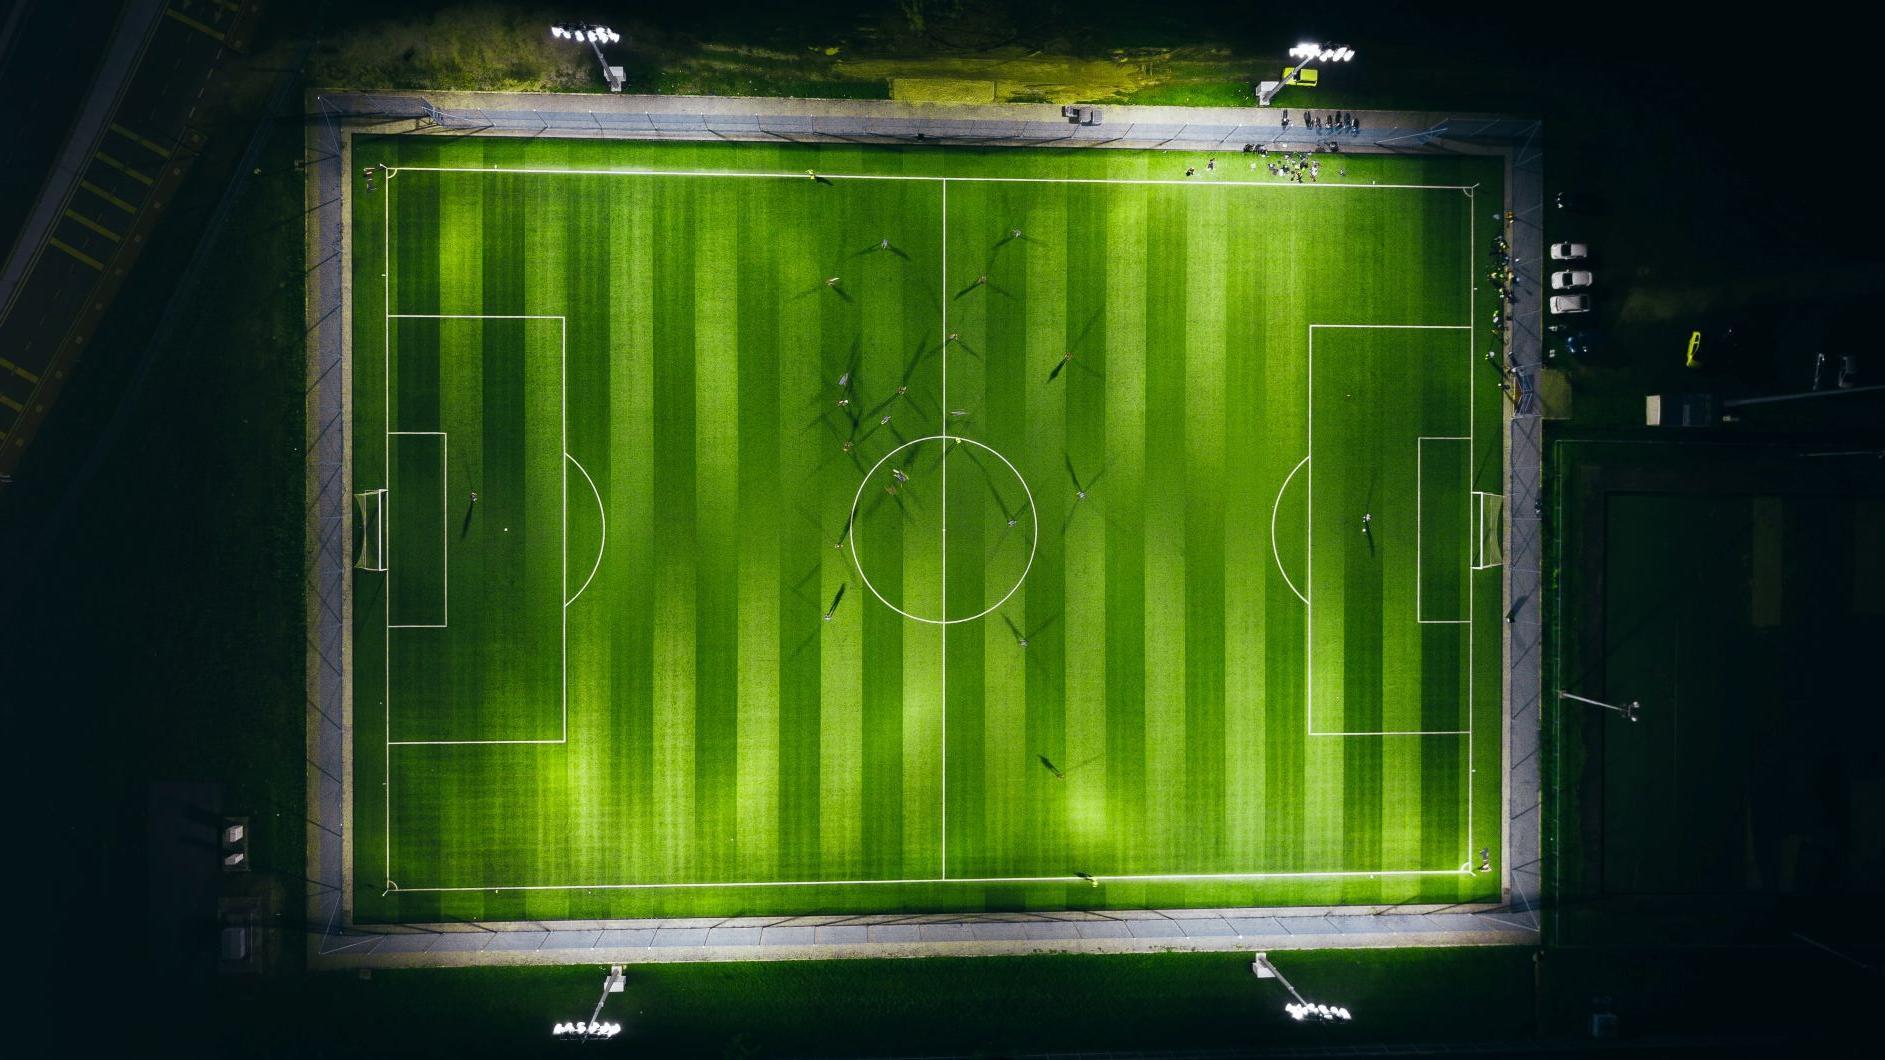 soccer field banner - izuddin-helmi-adnan-K5ChxJaheKI-unsplash